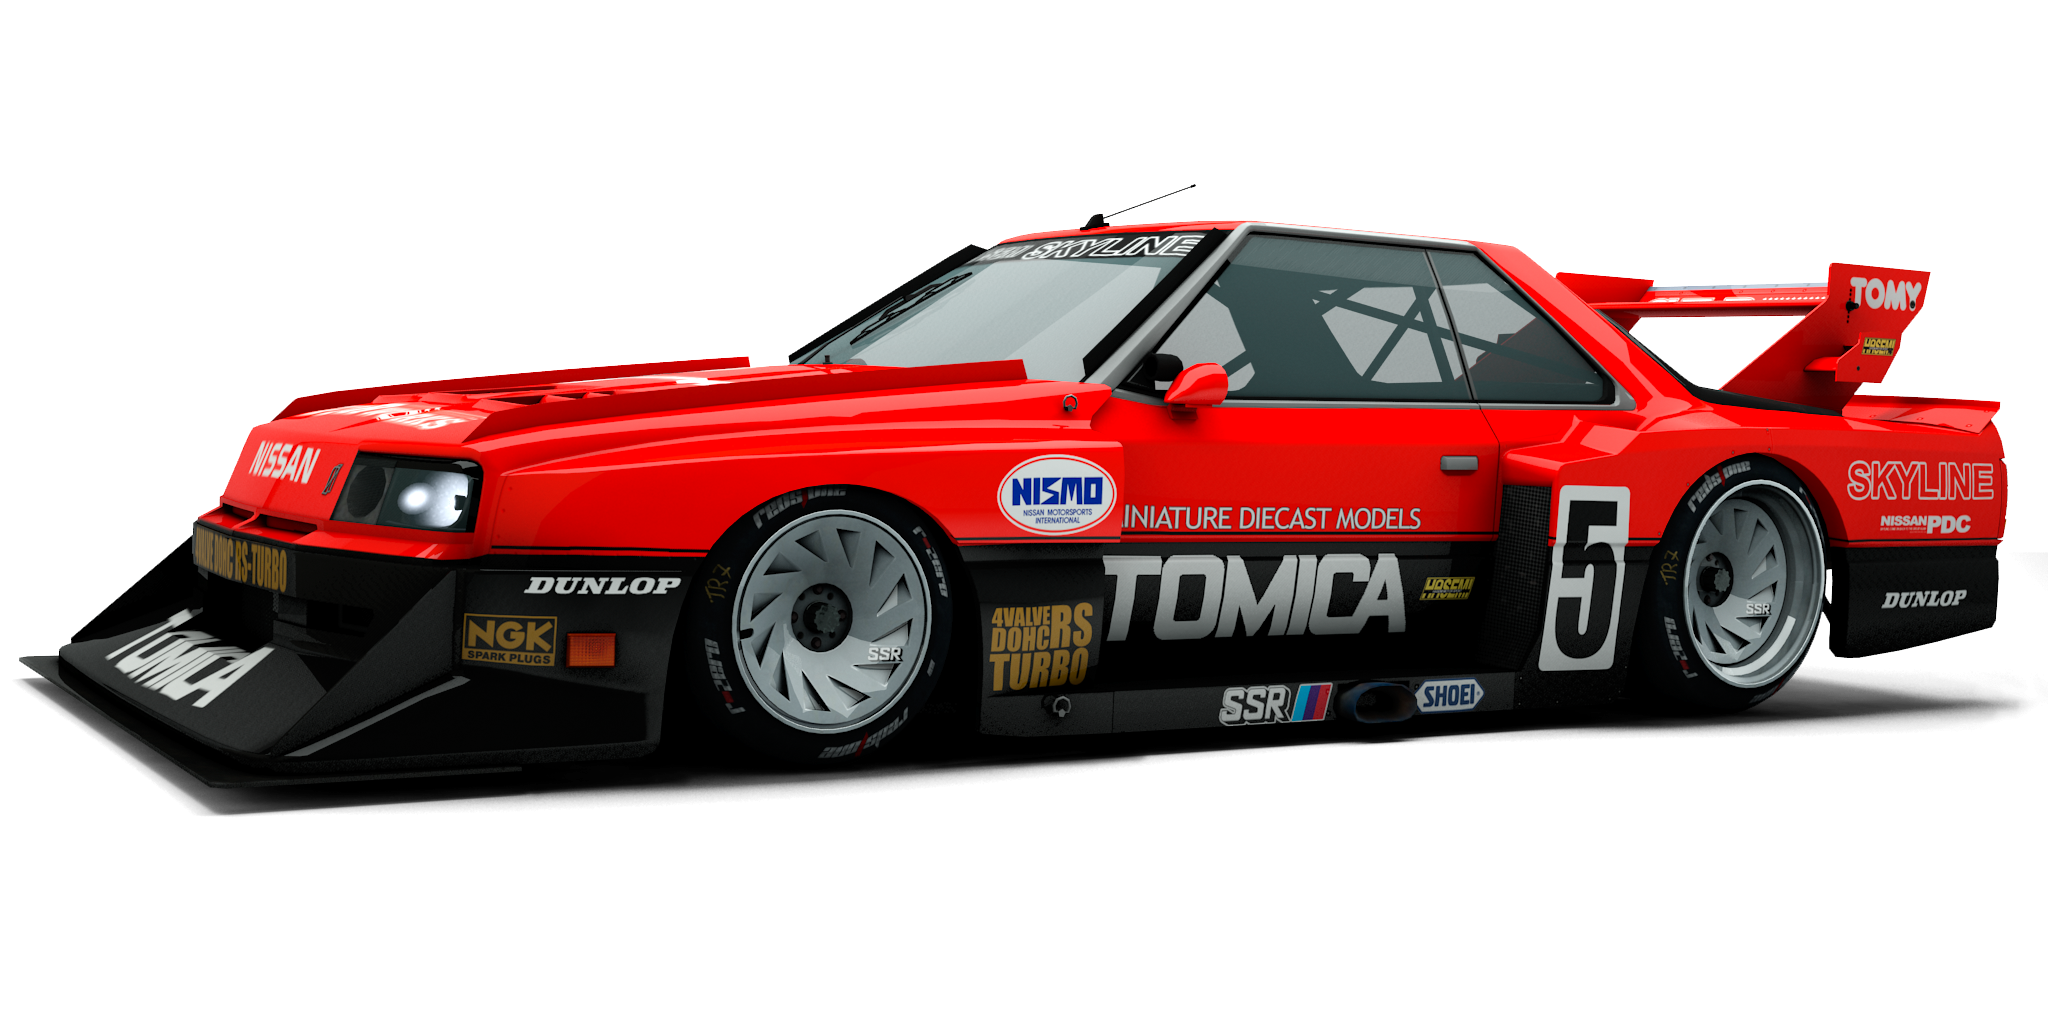 2048x1024 Nissan Silvia Turbo Joins Raceroom's Group 5 Lineup